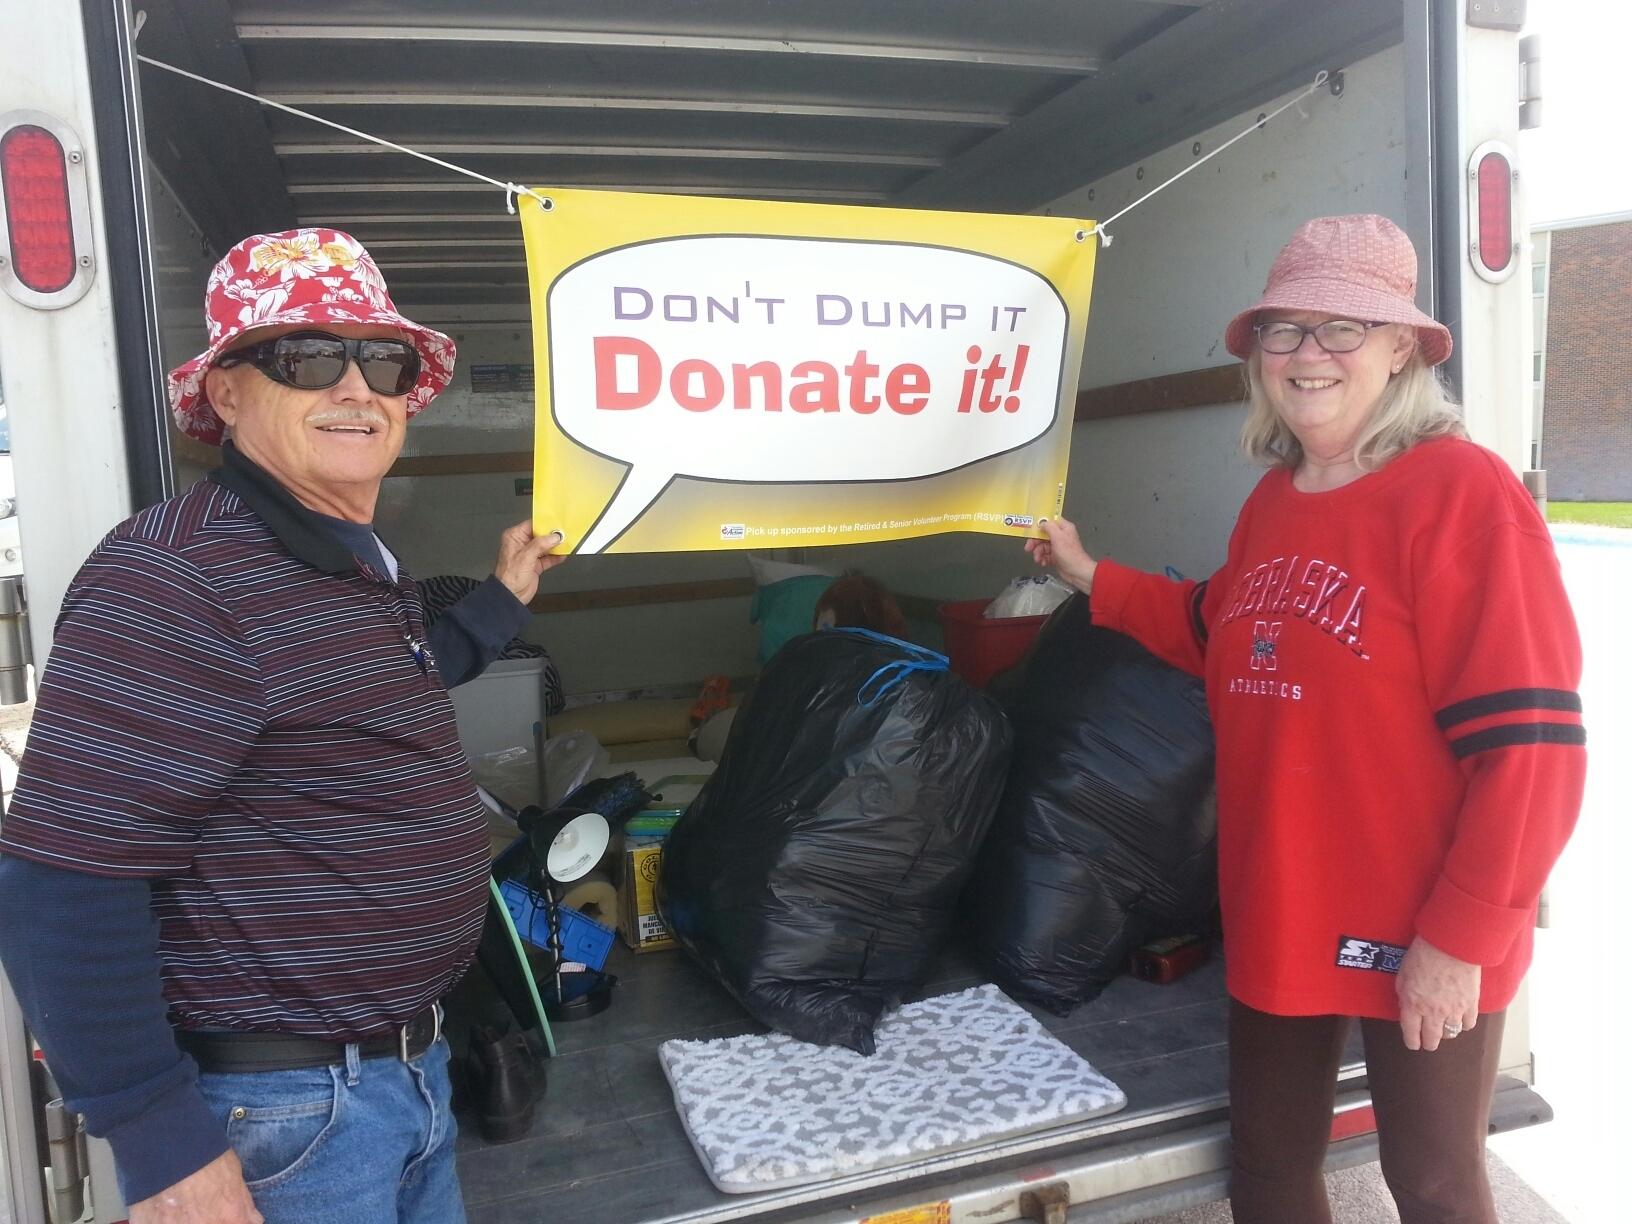 Donate dont dump 2